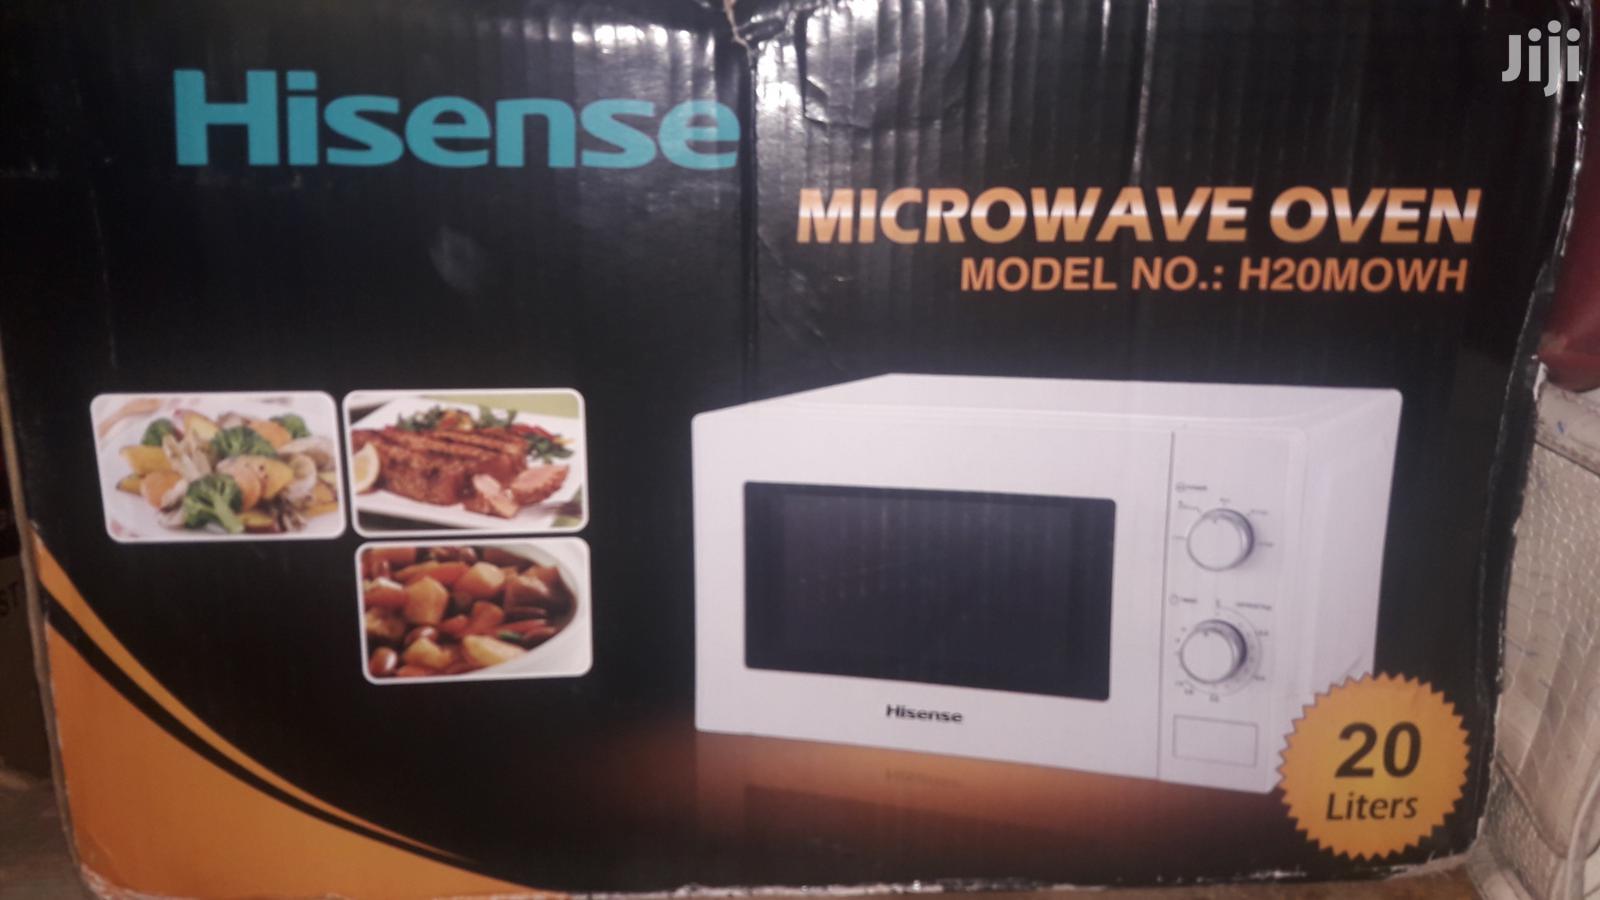 Hisense Microwave Oven - 20 Litres